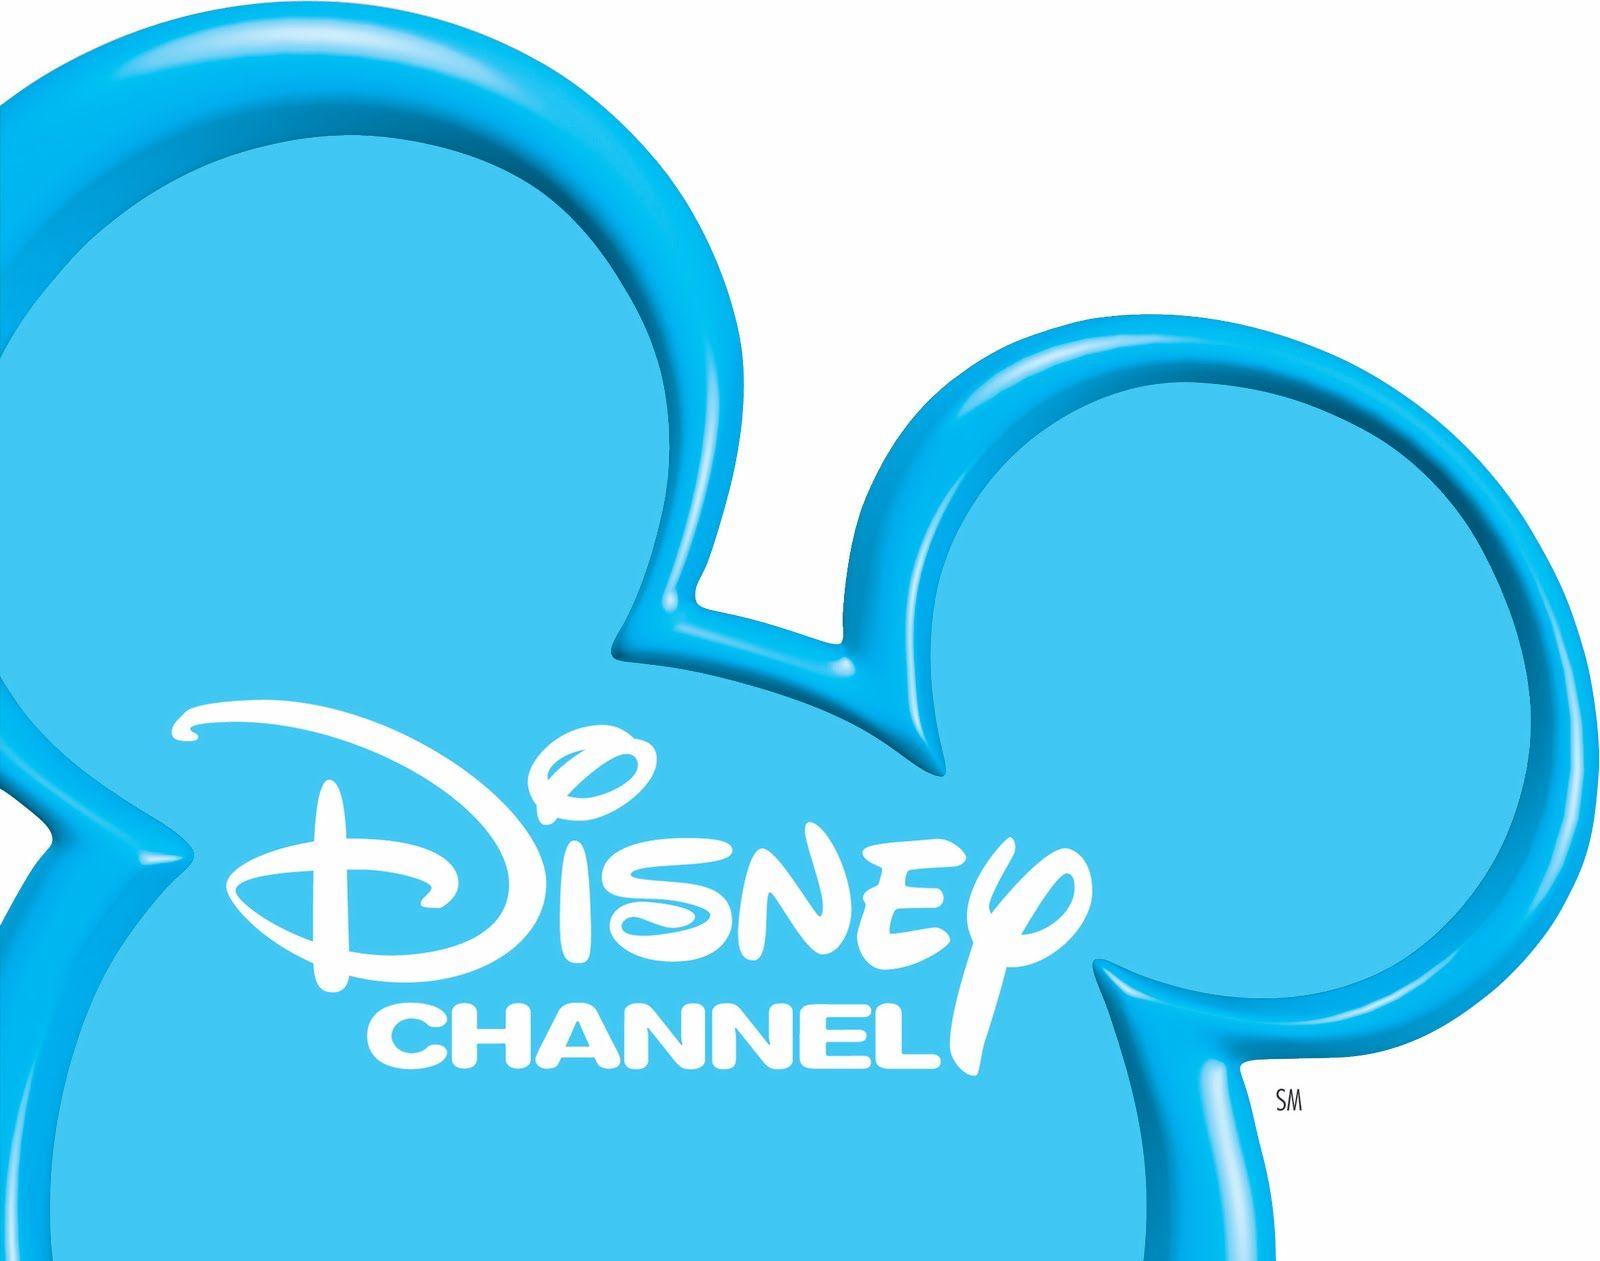 Disney Channel Logo - Do you like Disney\'s Tsum Tsum Plush Toys ...